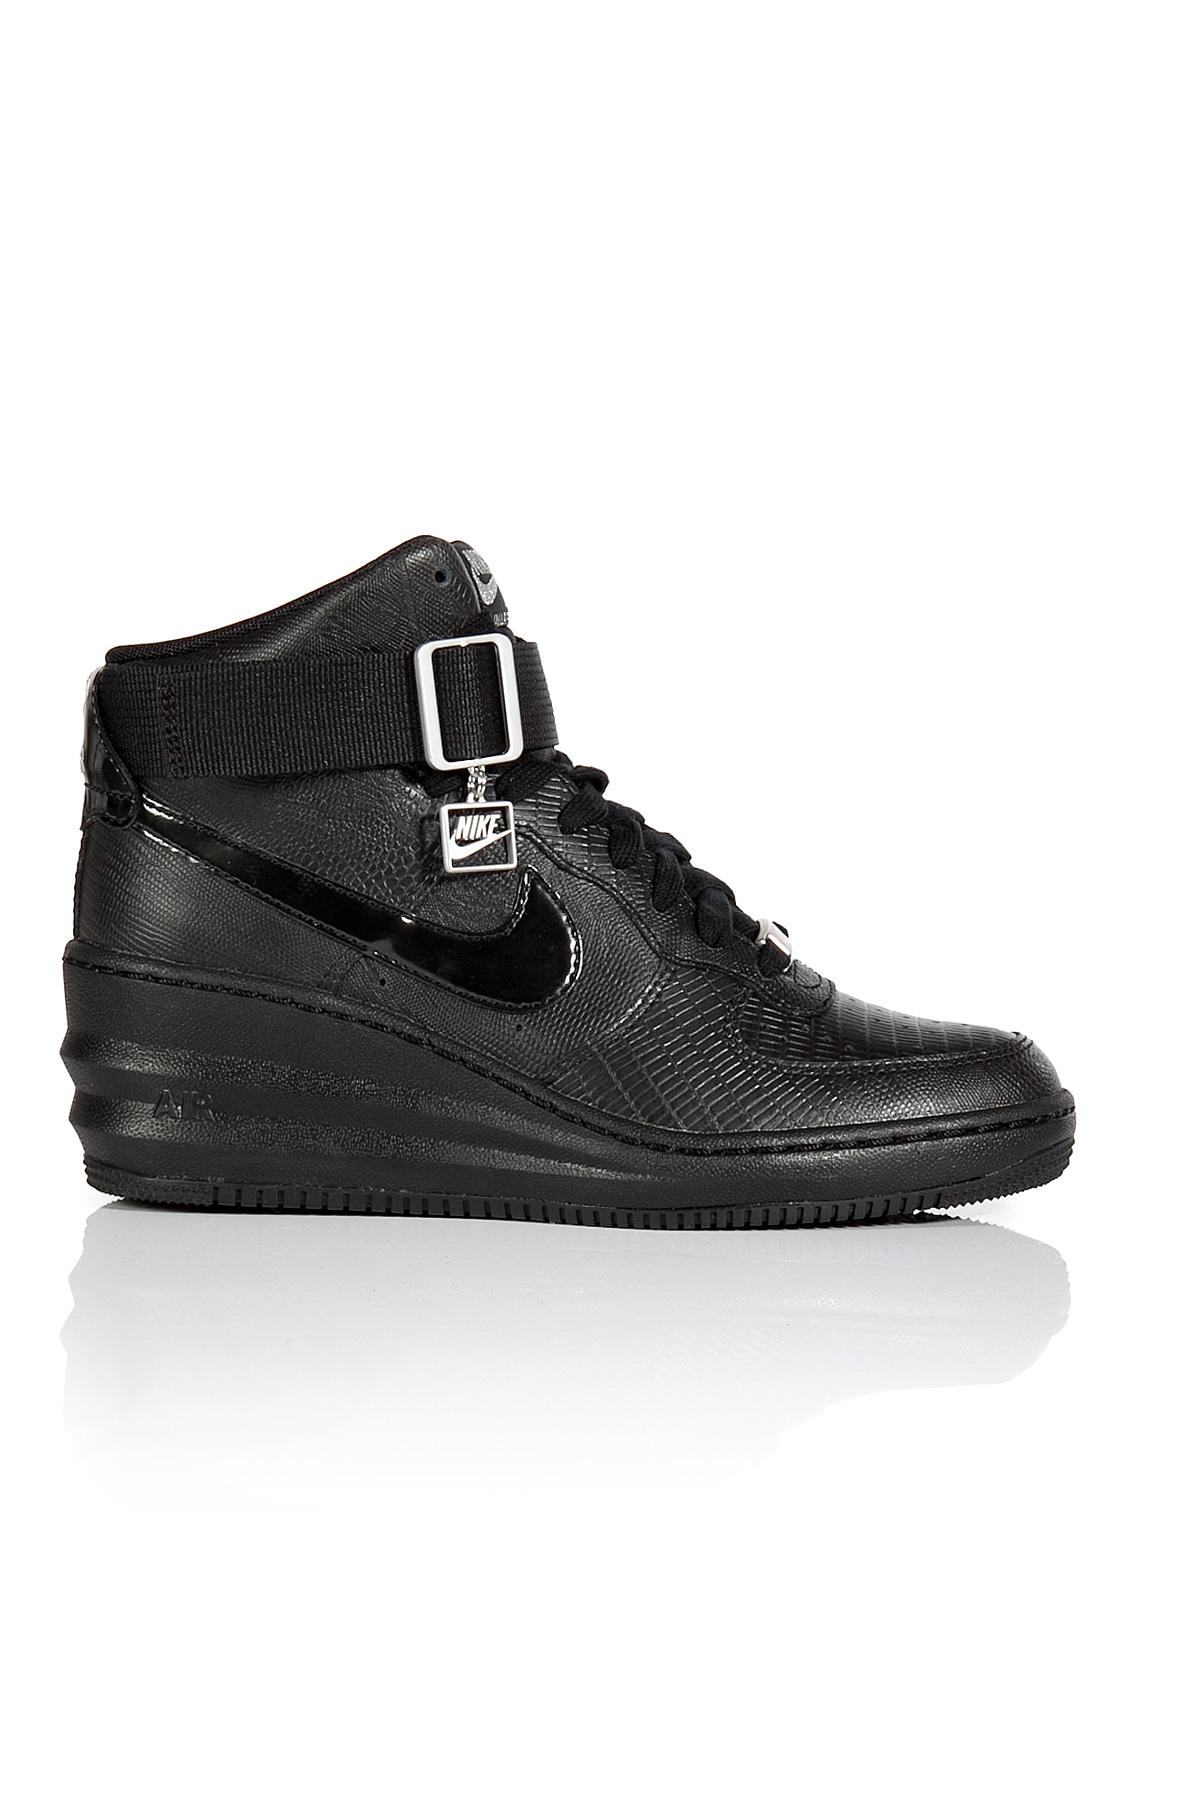 3d58a9b6318d Lyst - Nike Lunar Force Sky Hi Wedge Sneakers - Black in Blue